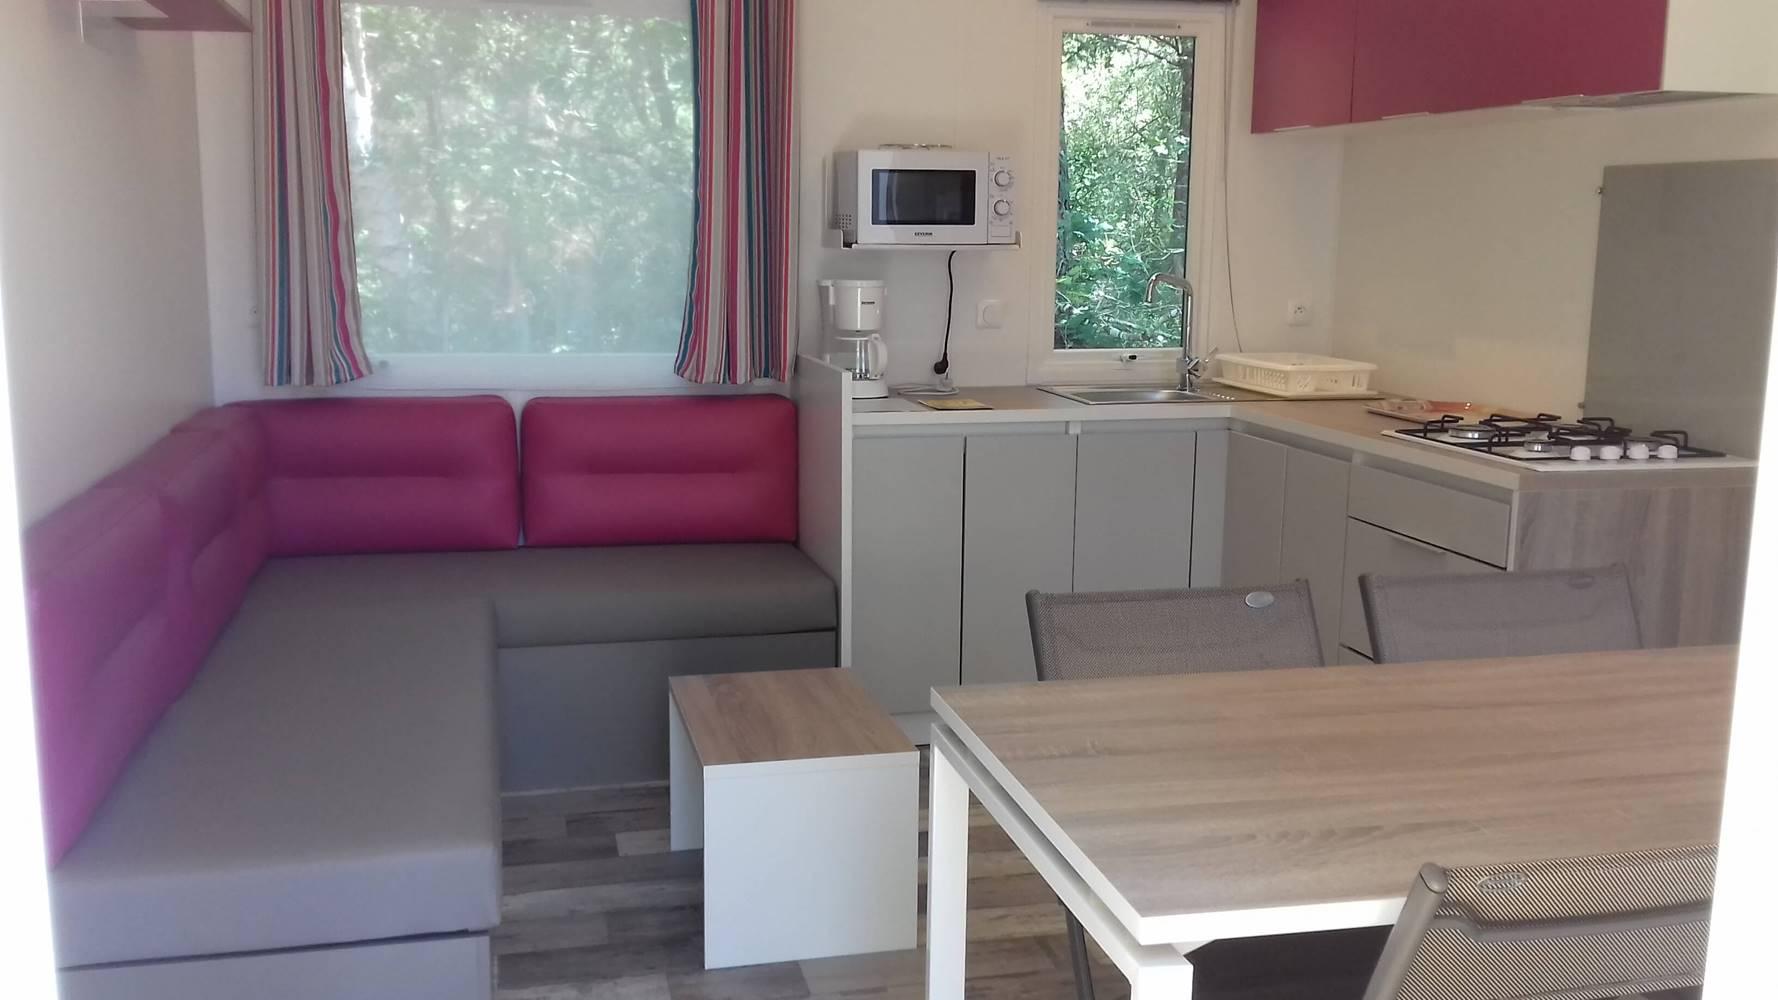 pièce de vie mobil home 3 chambres 2017-camping kergo-carnac-morbihan ©